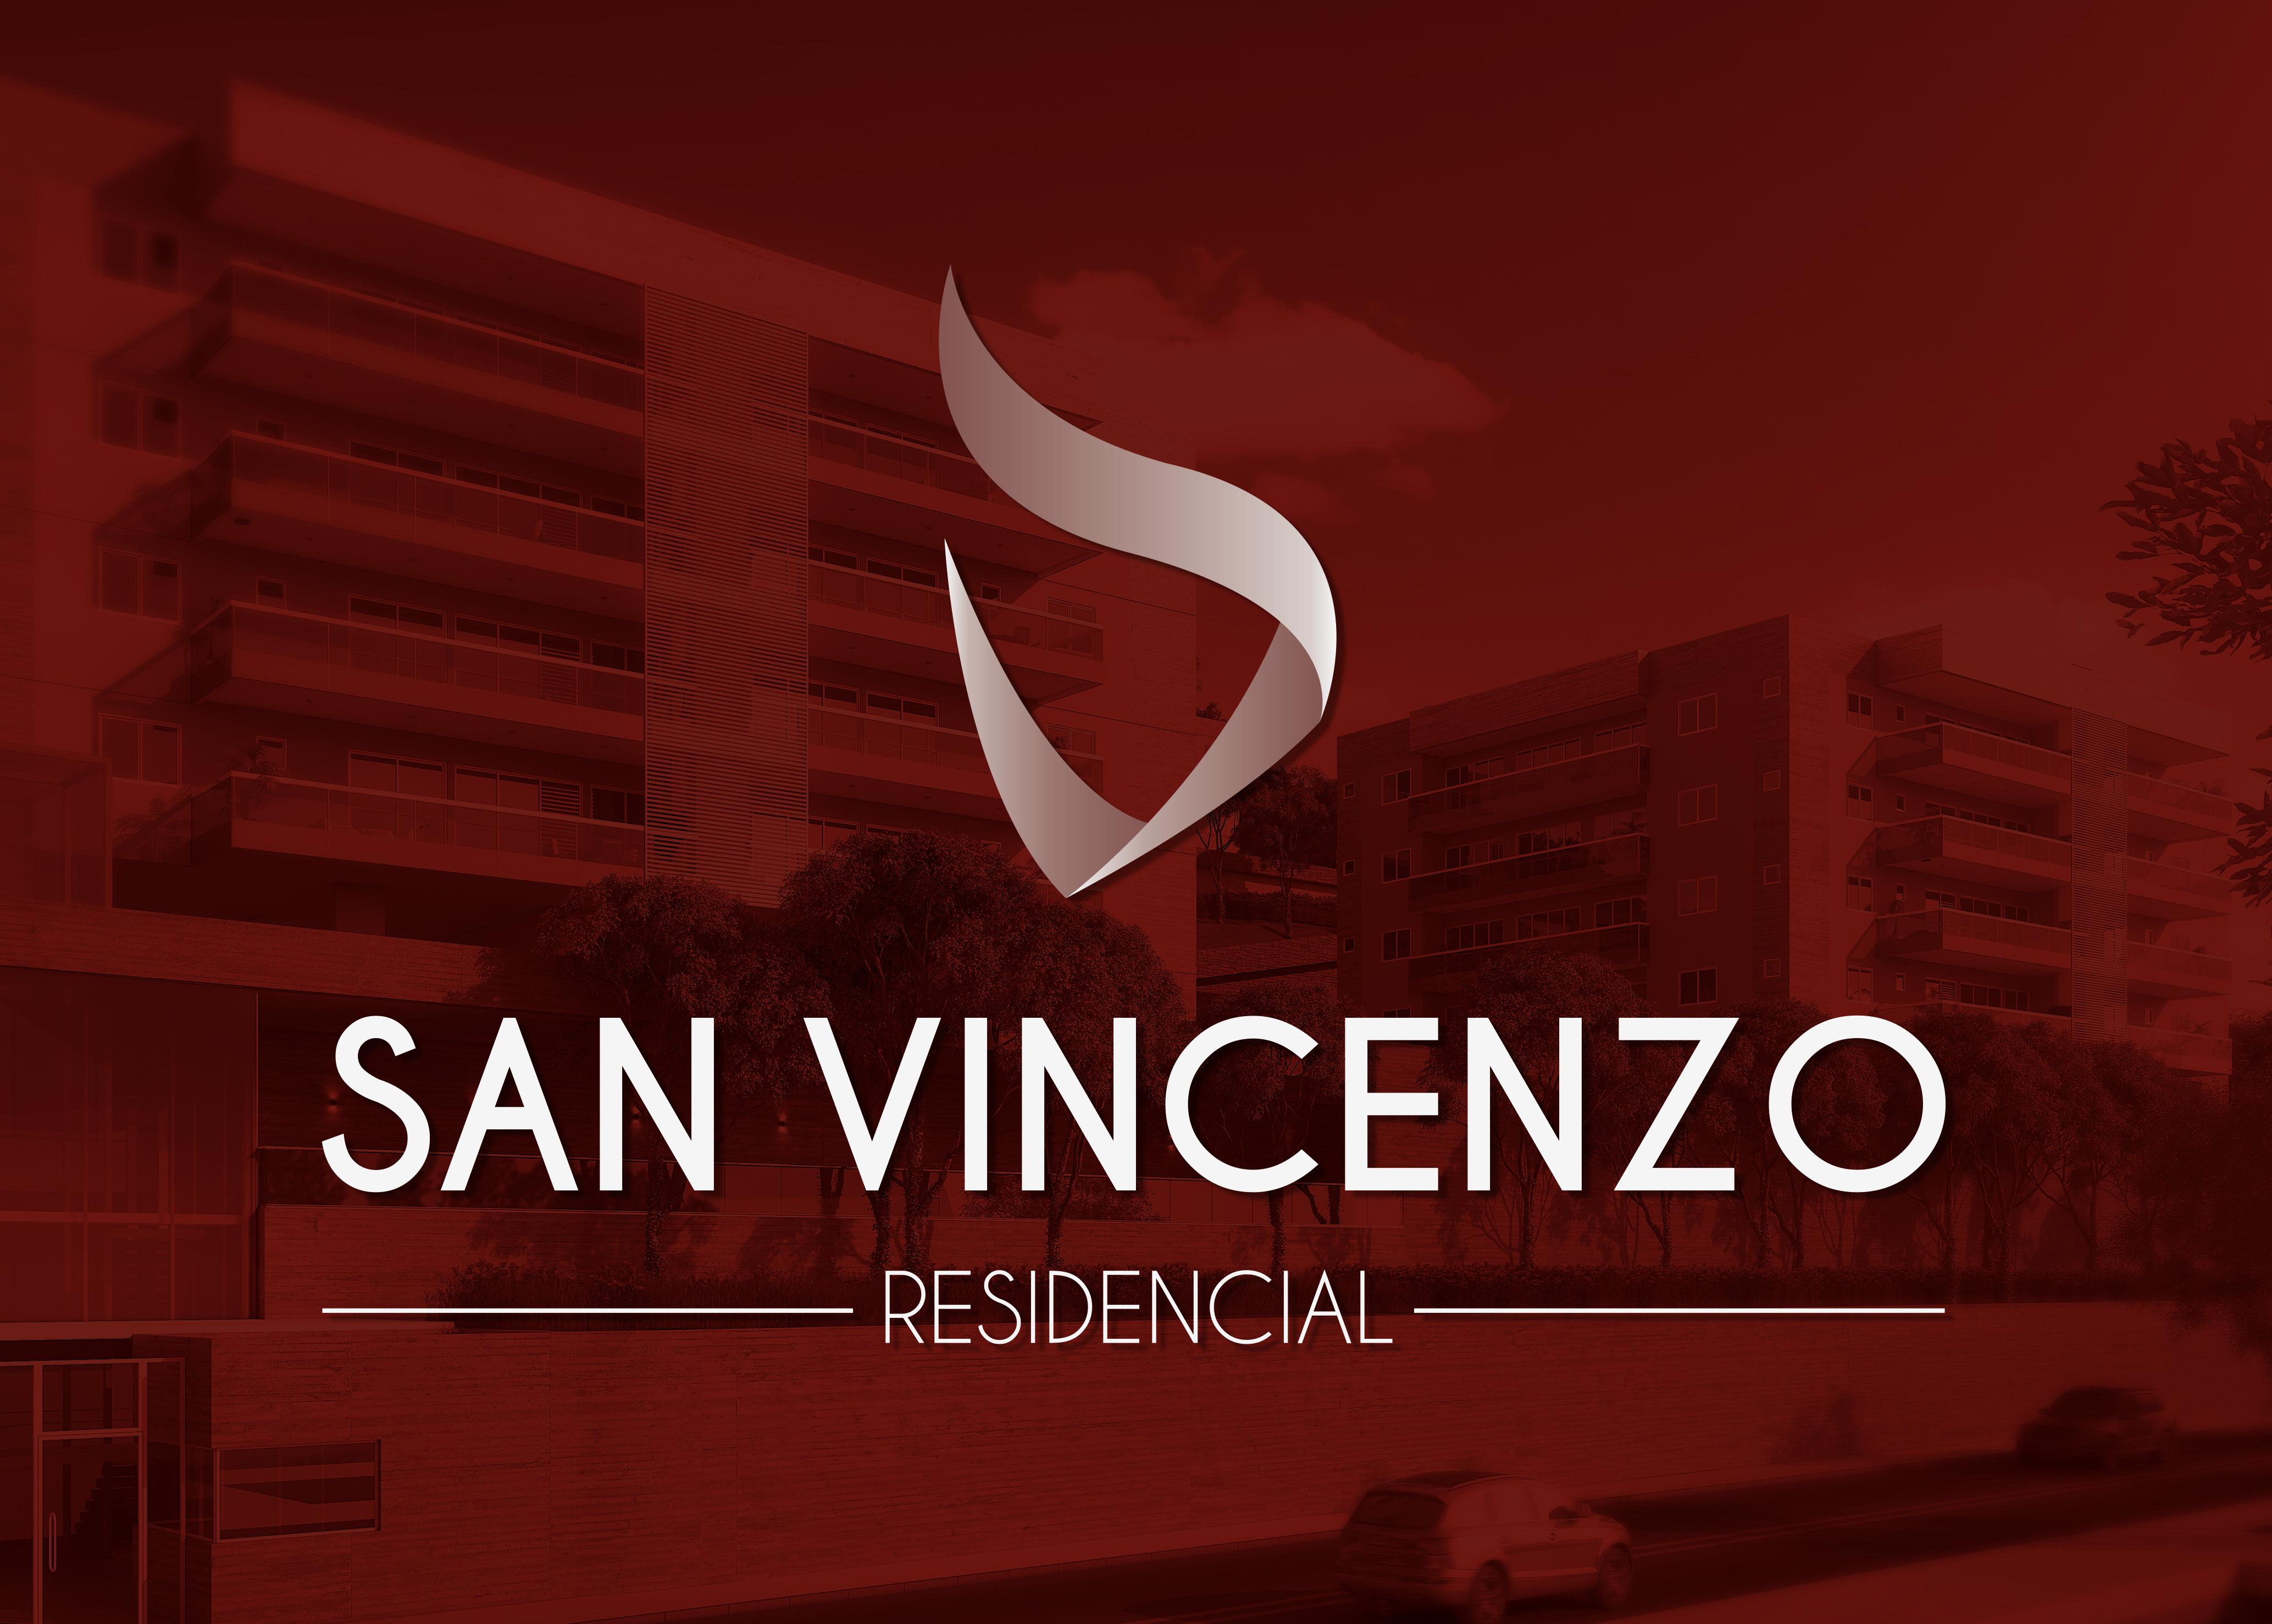 San Vincenzo - 25x35cm